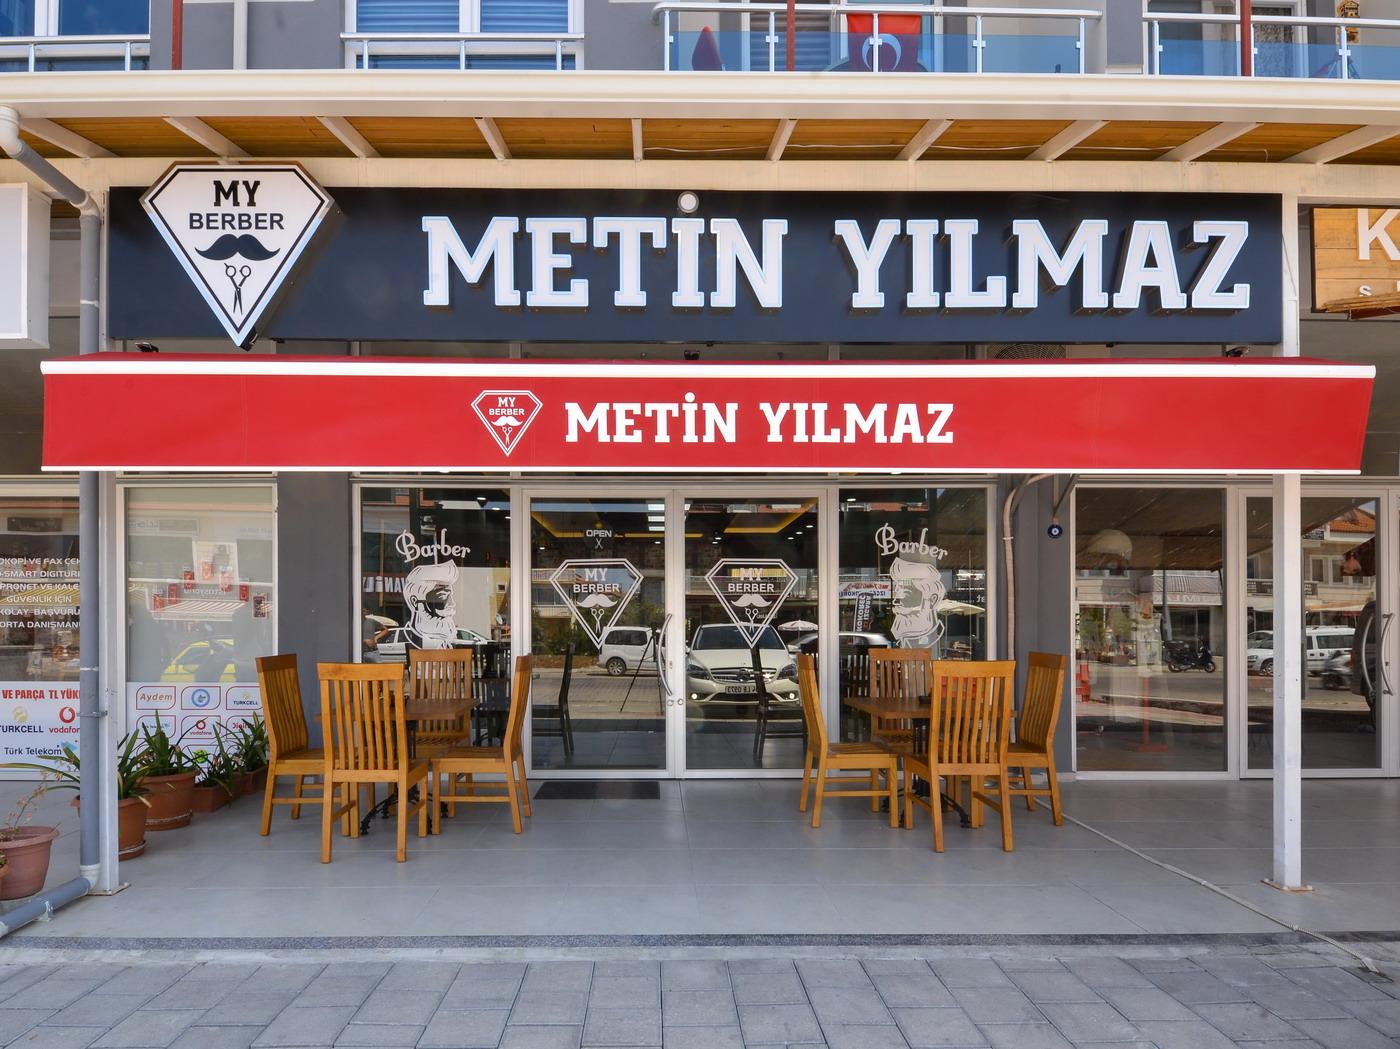 Muğla - Metin YILMAZ MY BERBER